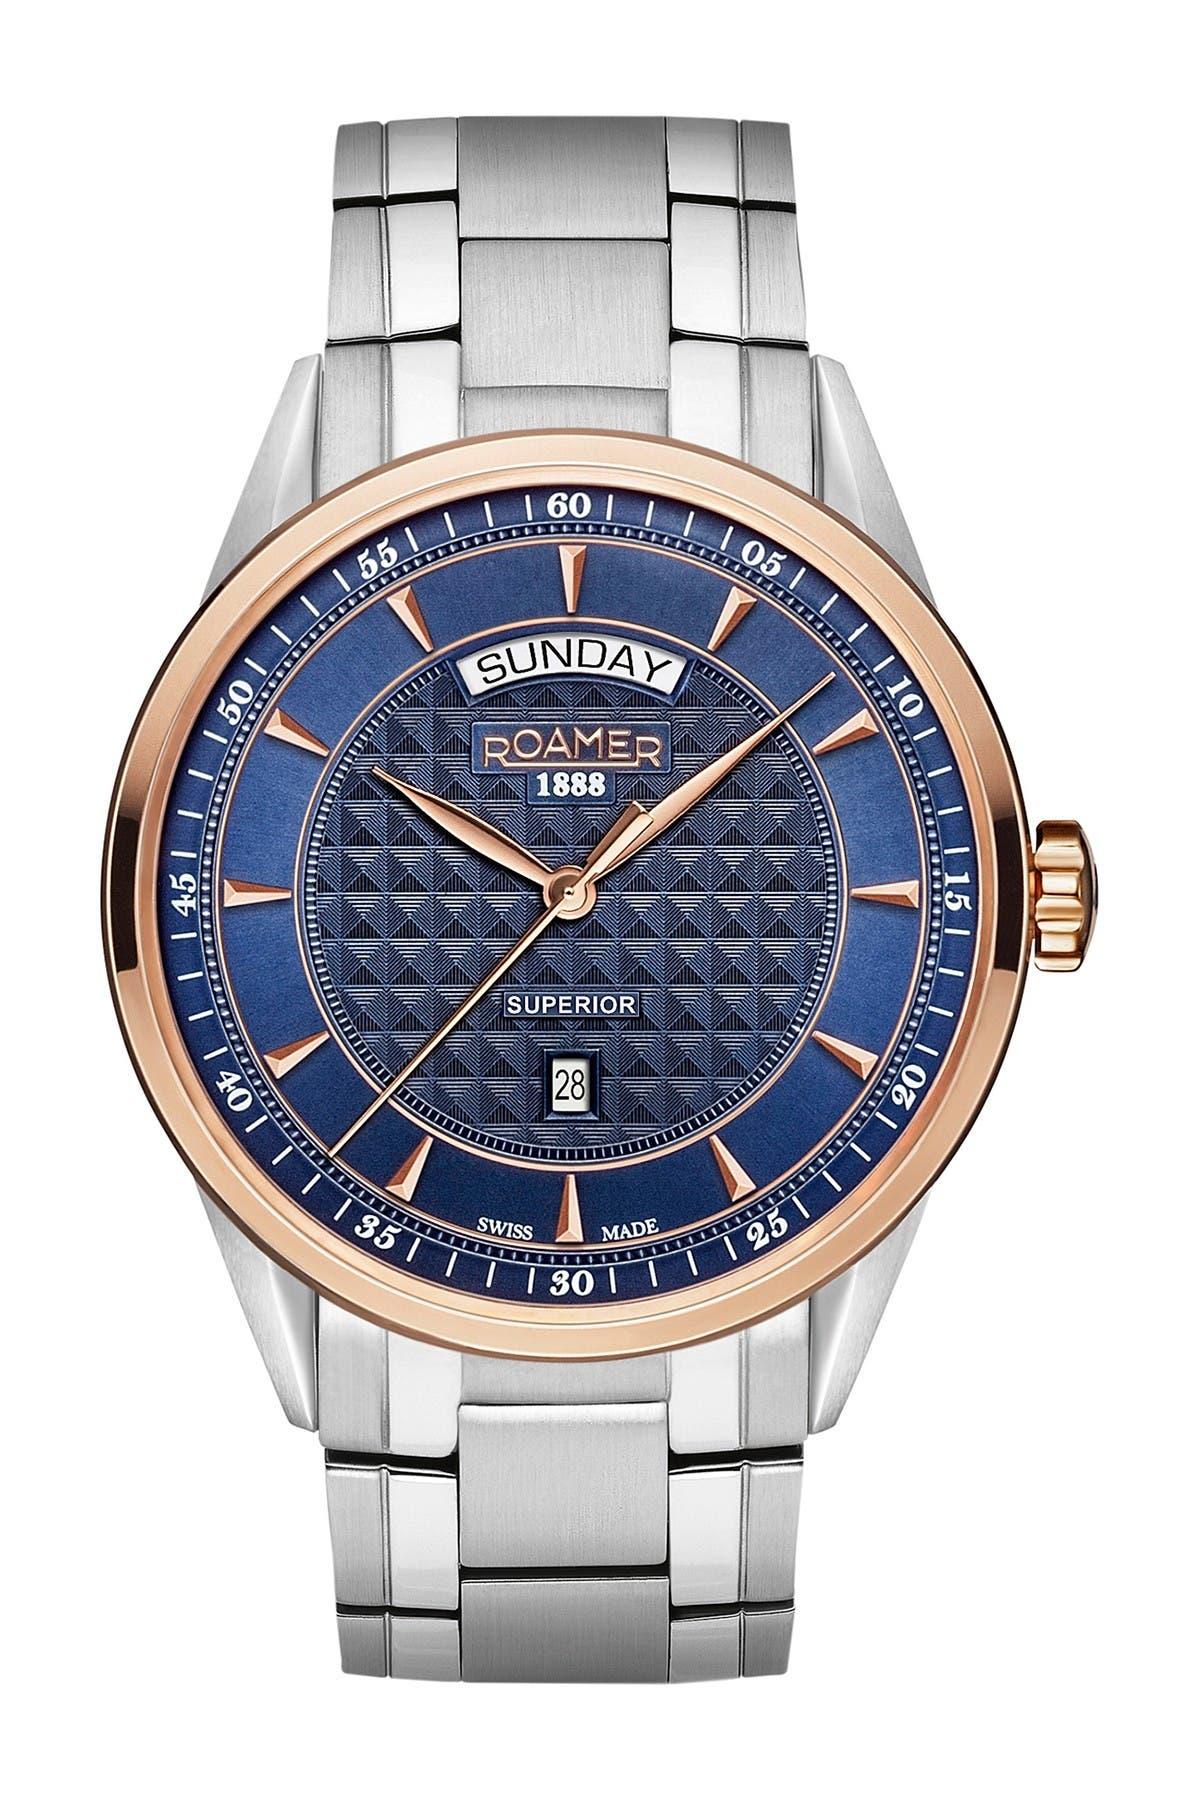 Image of Roamer Men's Superior Day Date Bracelet Watch